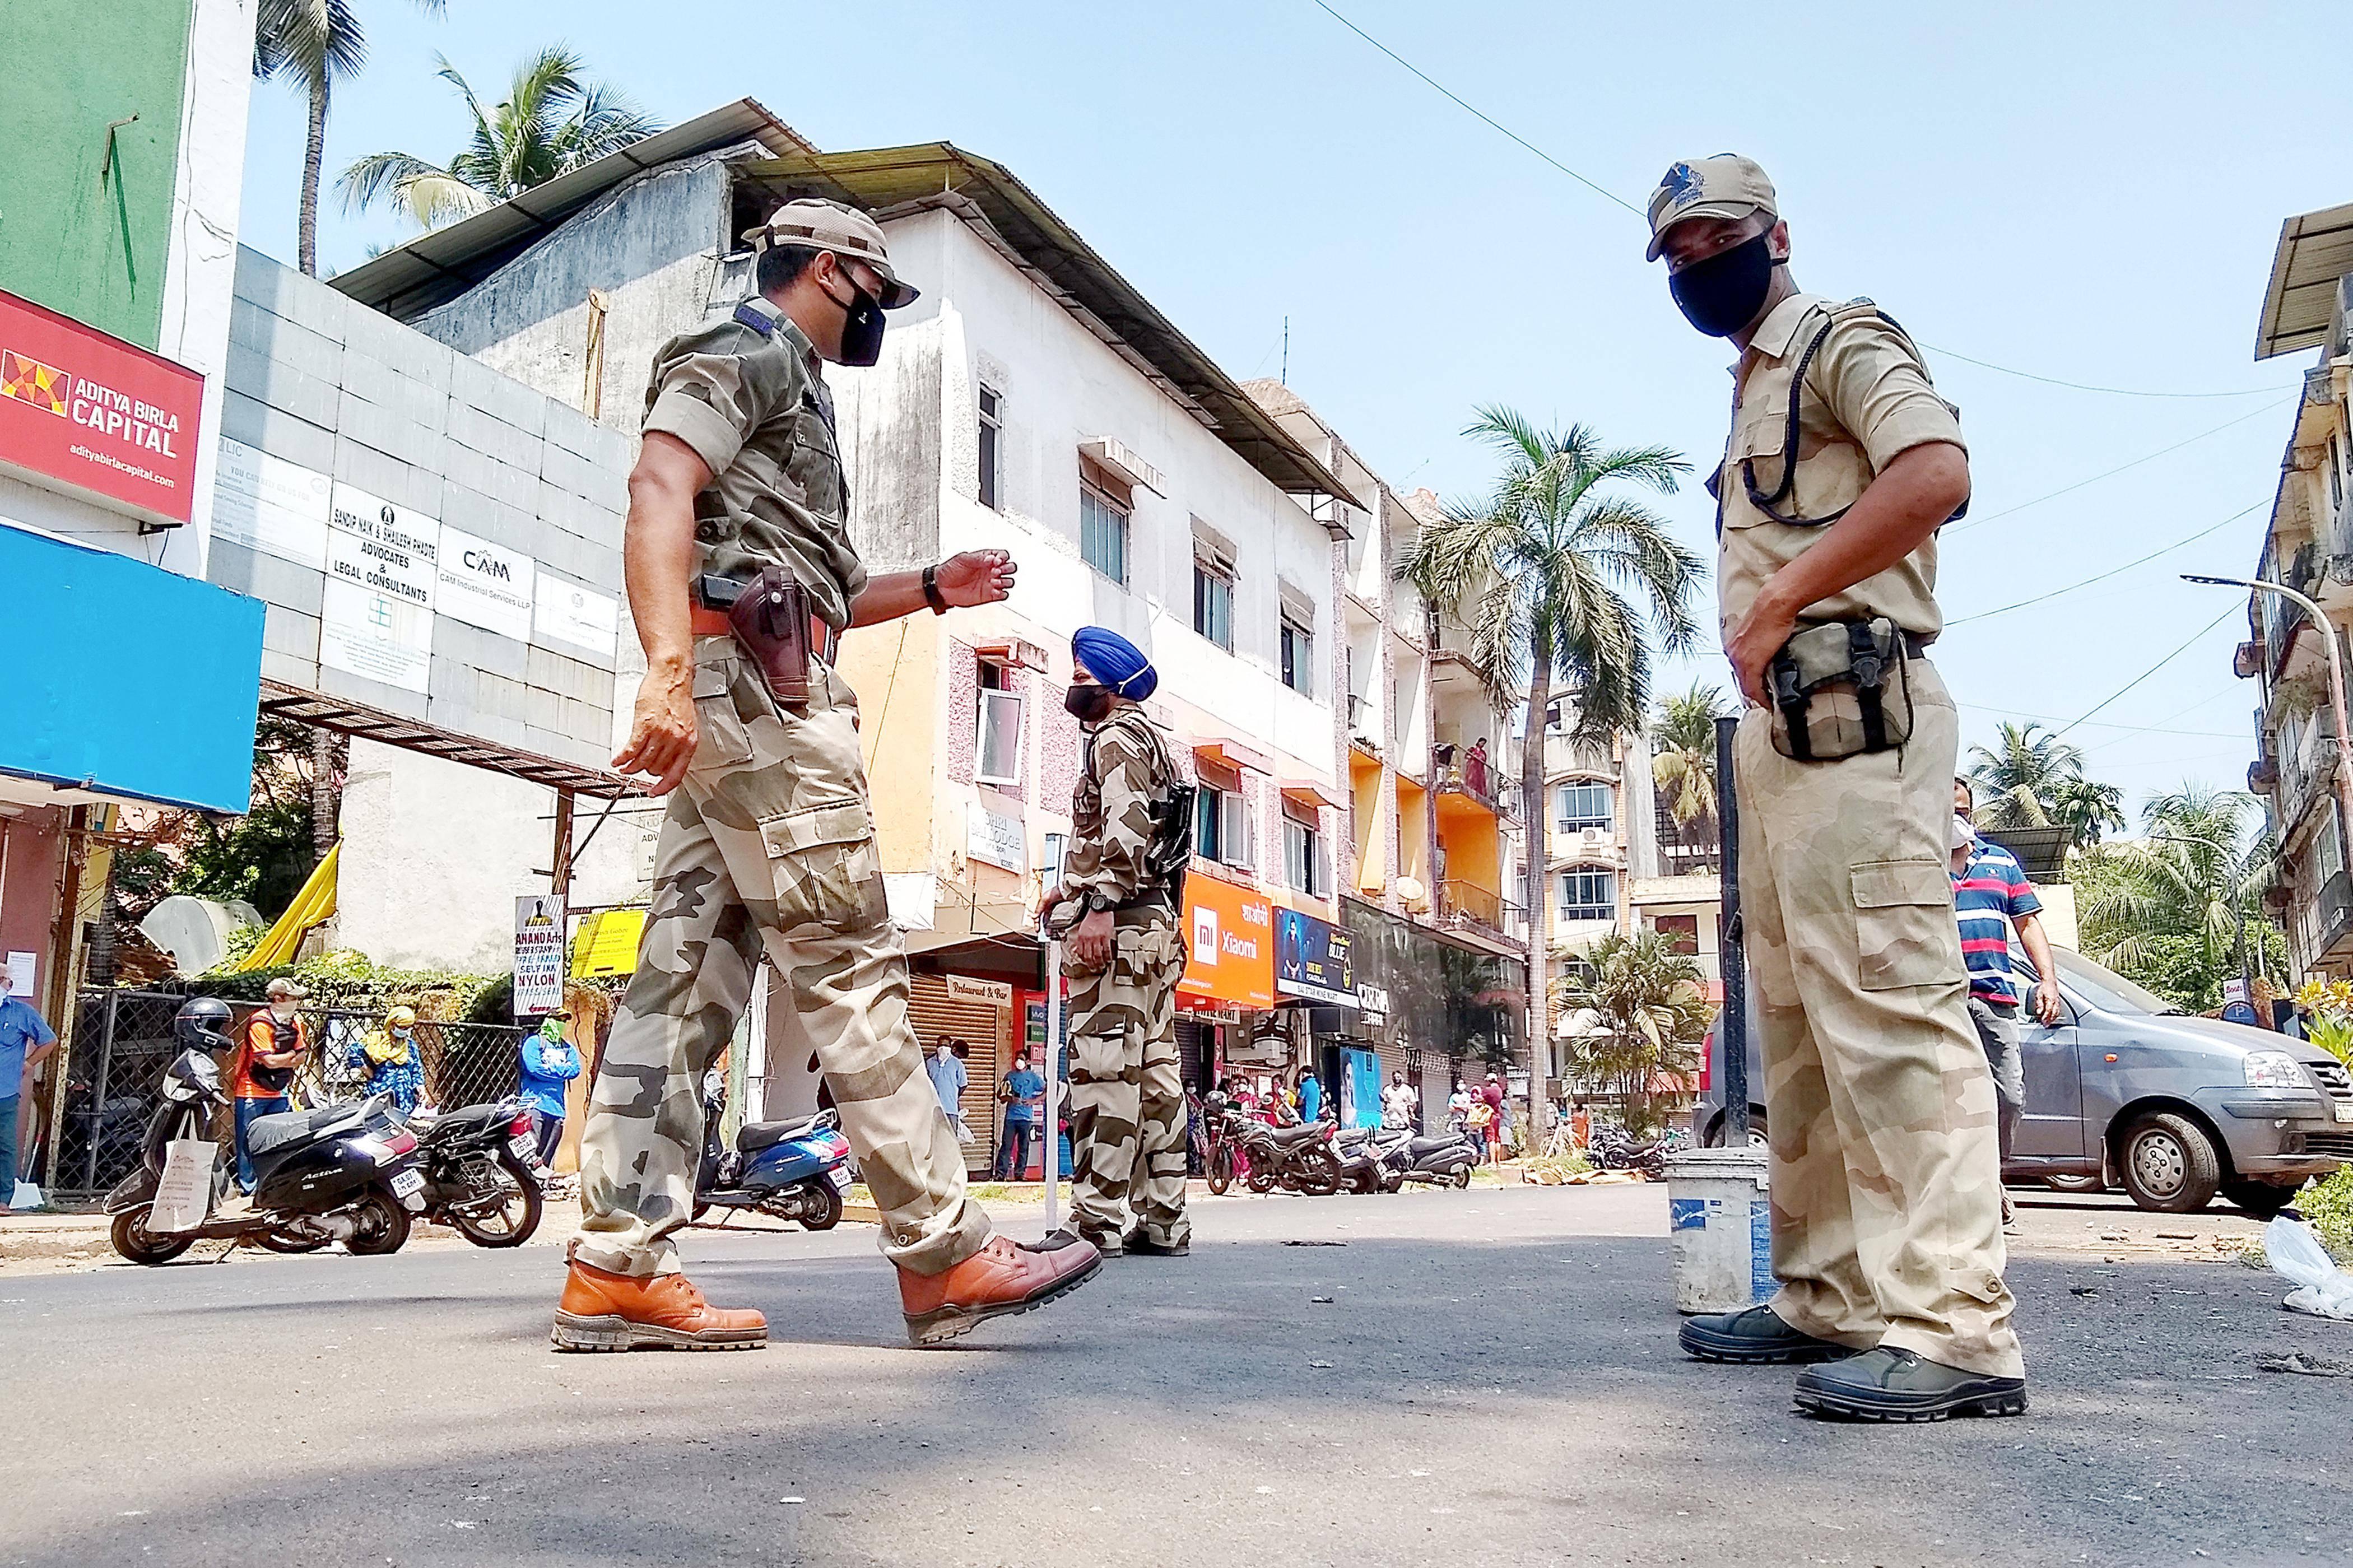 Goa: Trouble in paradise, as Covid wreaks havoc - News